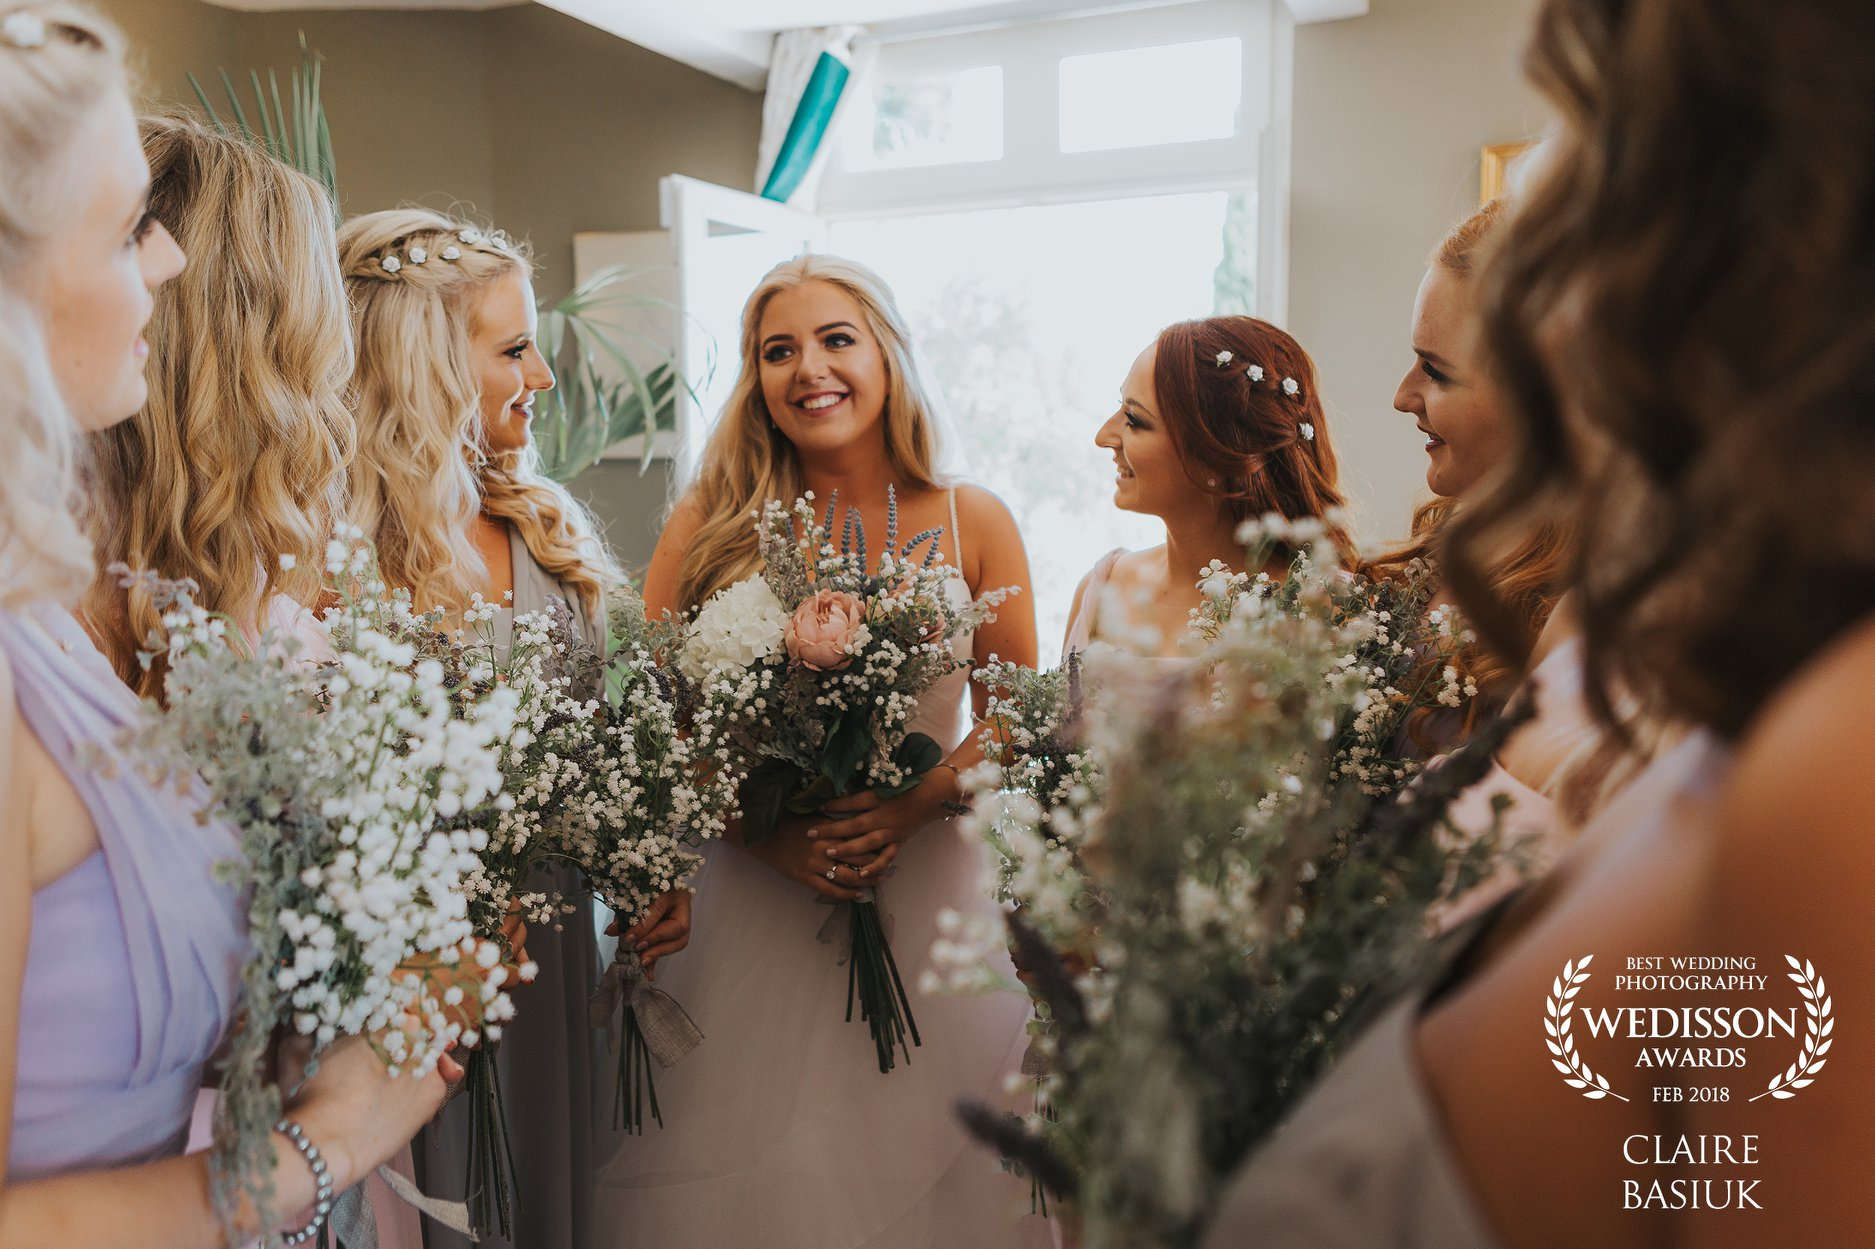 DIY Wedding Inspiration - Claire Basiuk Photography - Creative Bride - 03.jpg